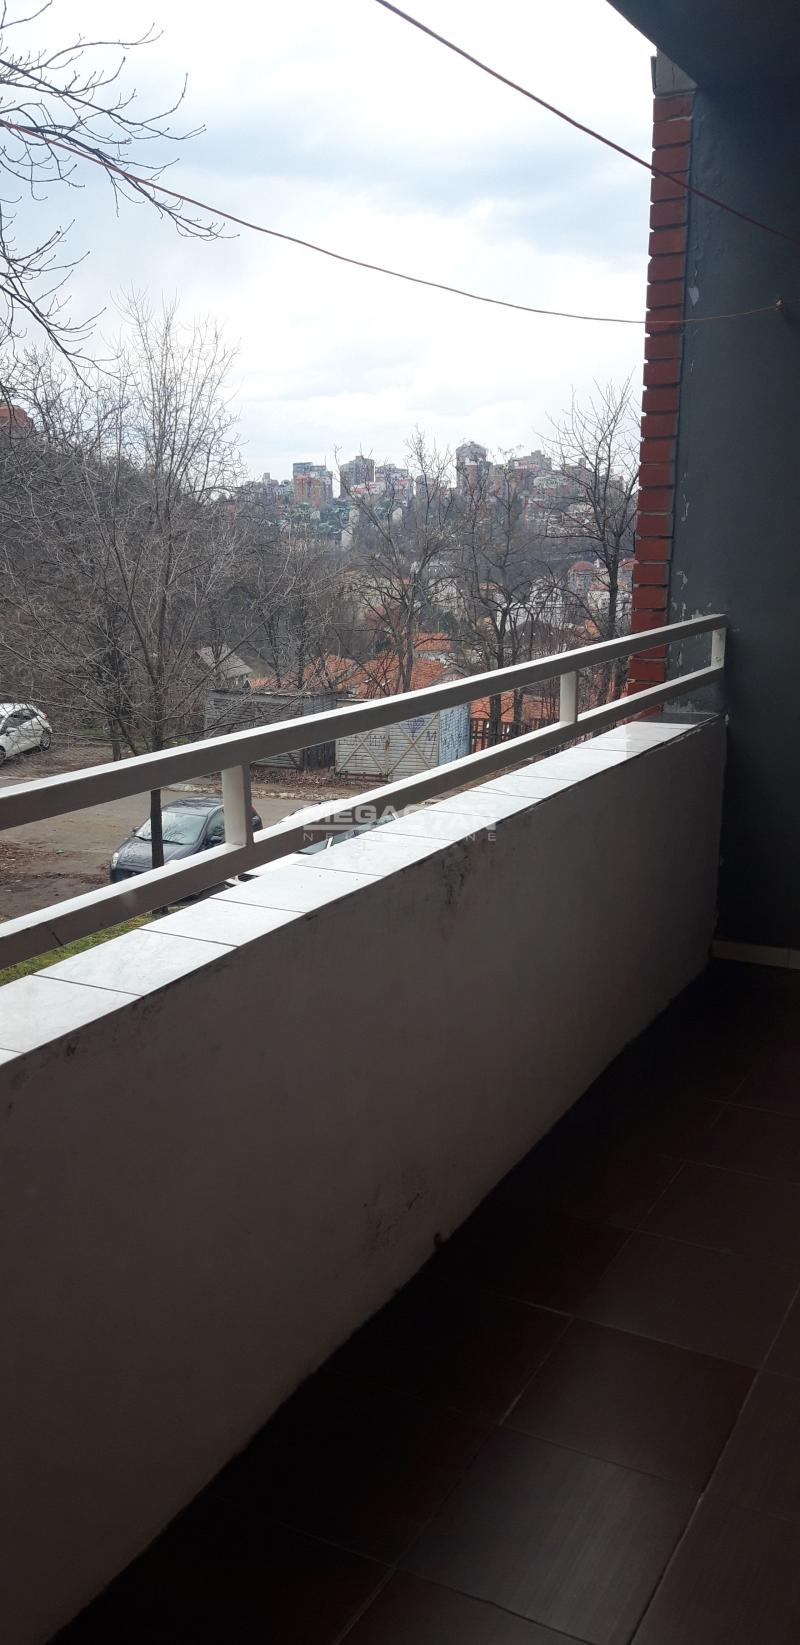 Stan Prodaja BEOGRAD Rakovica Labudovo Brdo